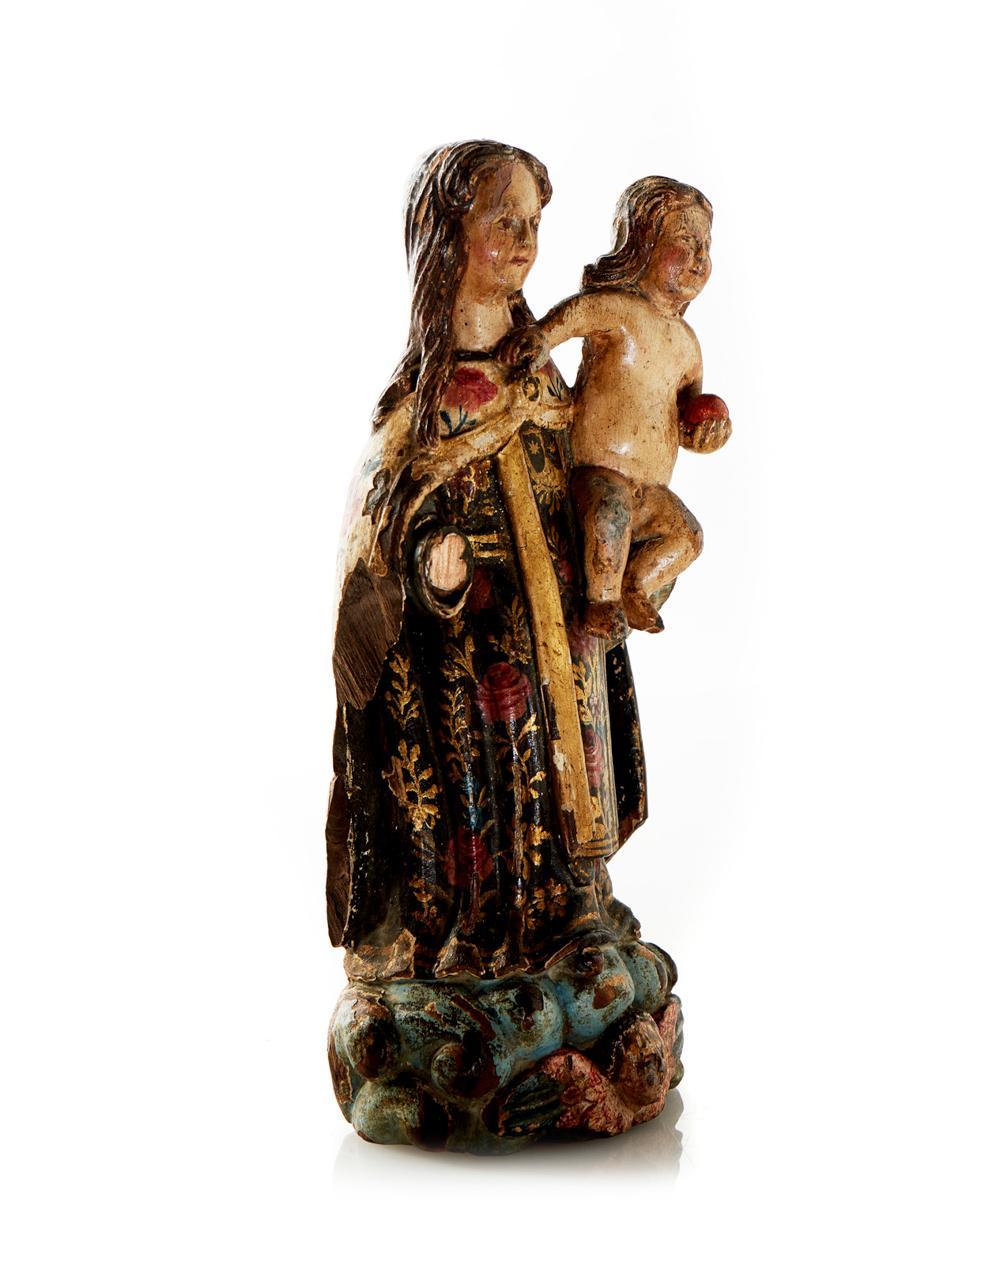 Nª Srª do Carmo c/Menino Jesus, Esc. XVII, madeira